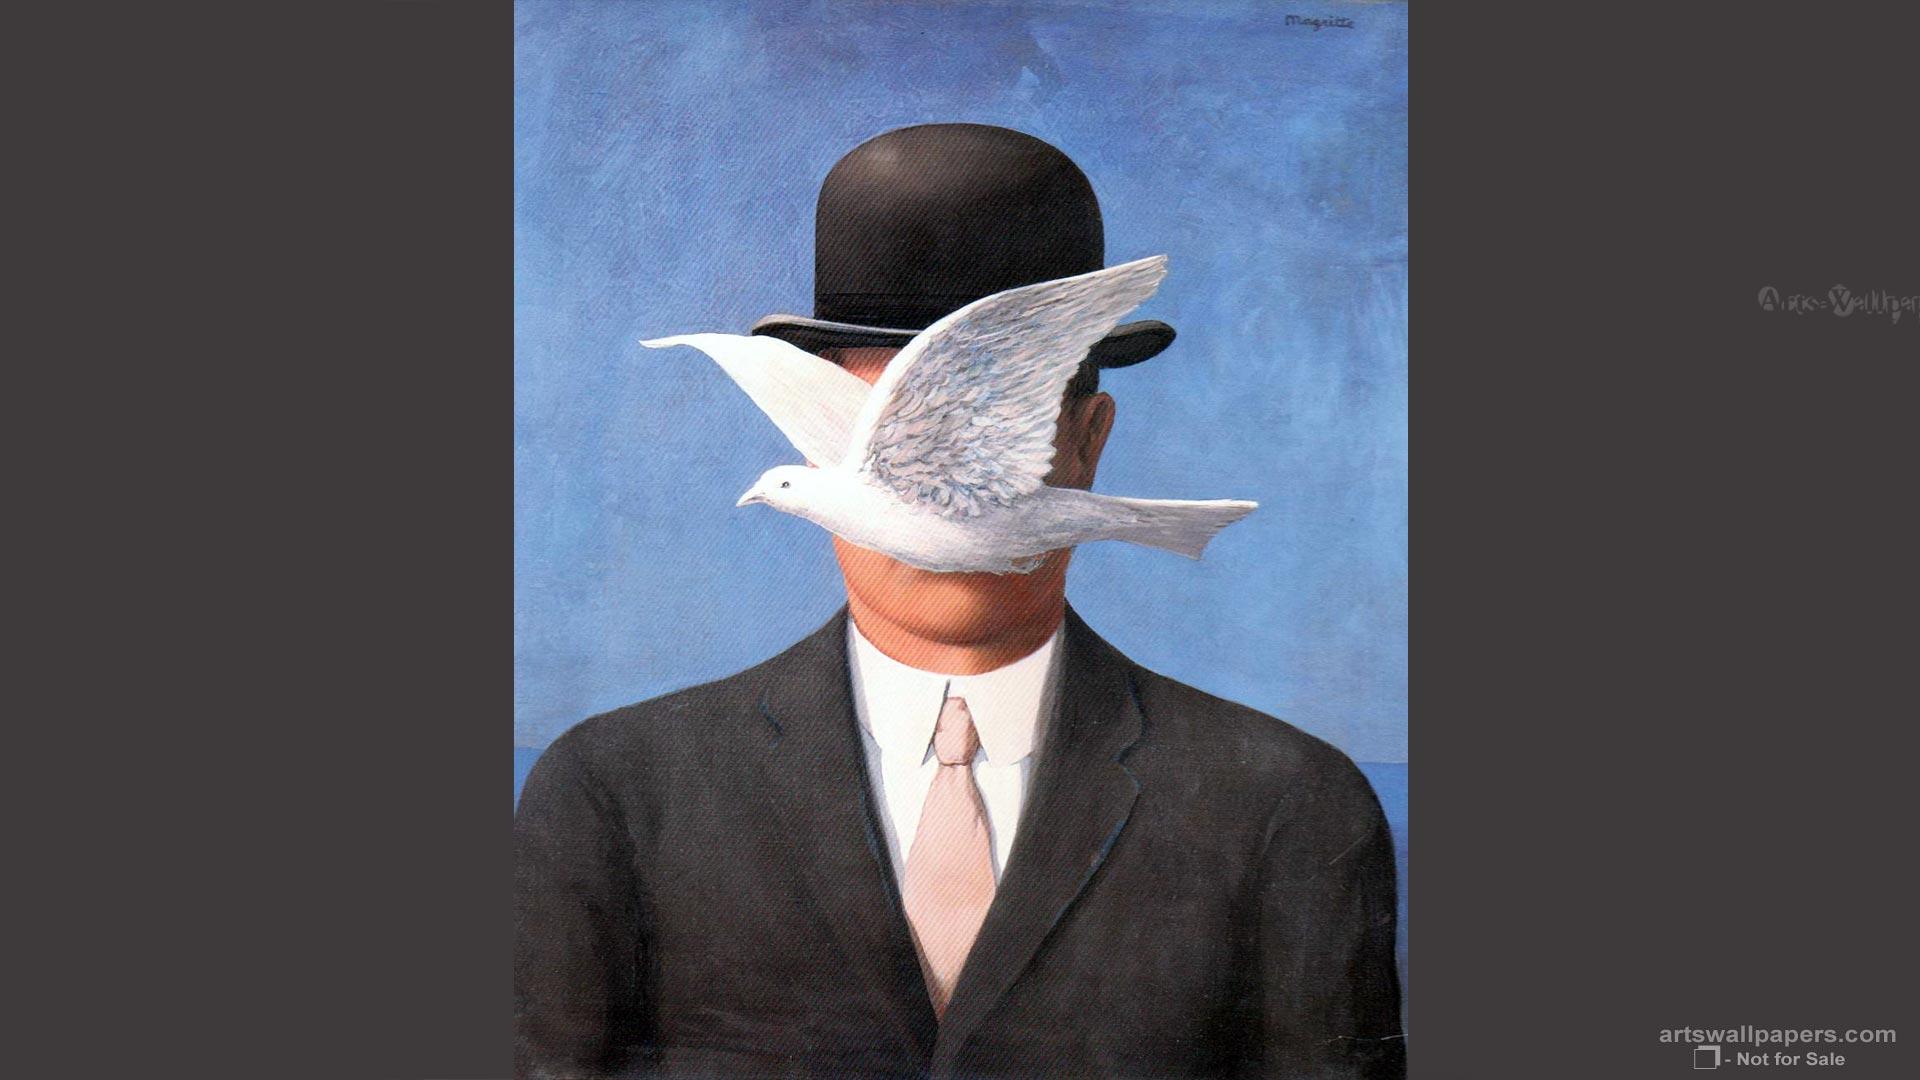 Rene Magritte Wallpapers Rene Magritte Art Paitning 1920x1080